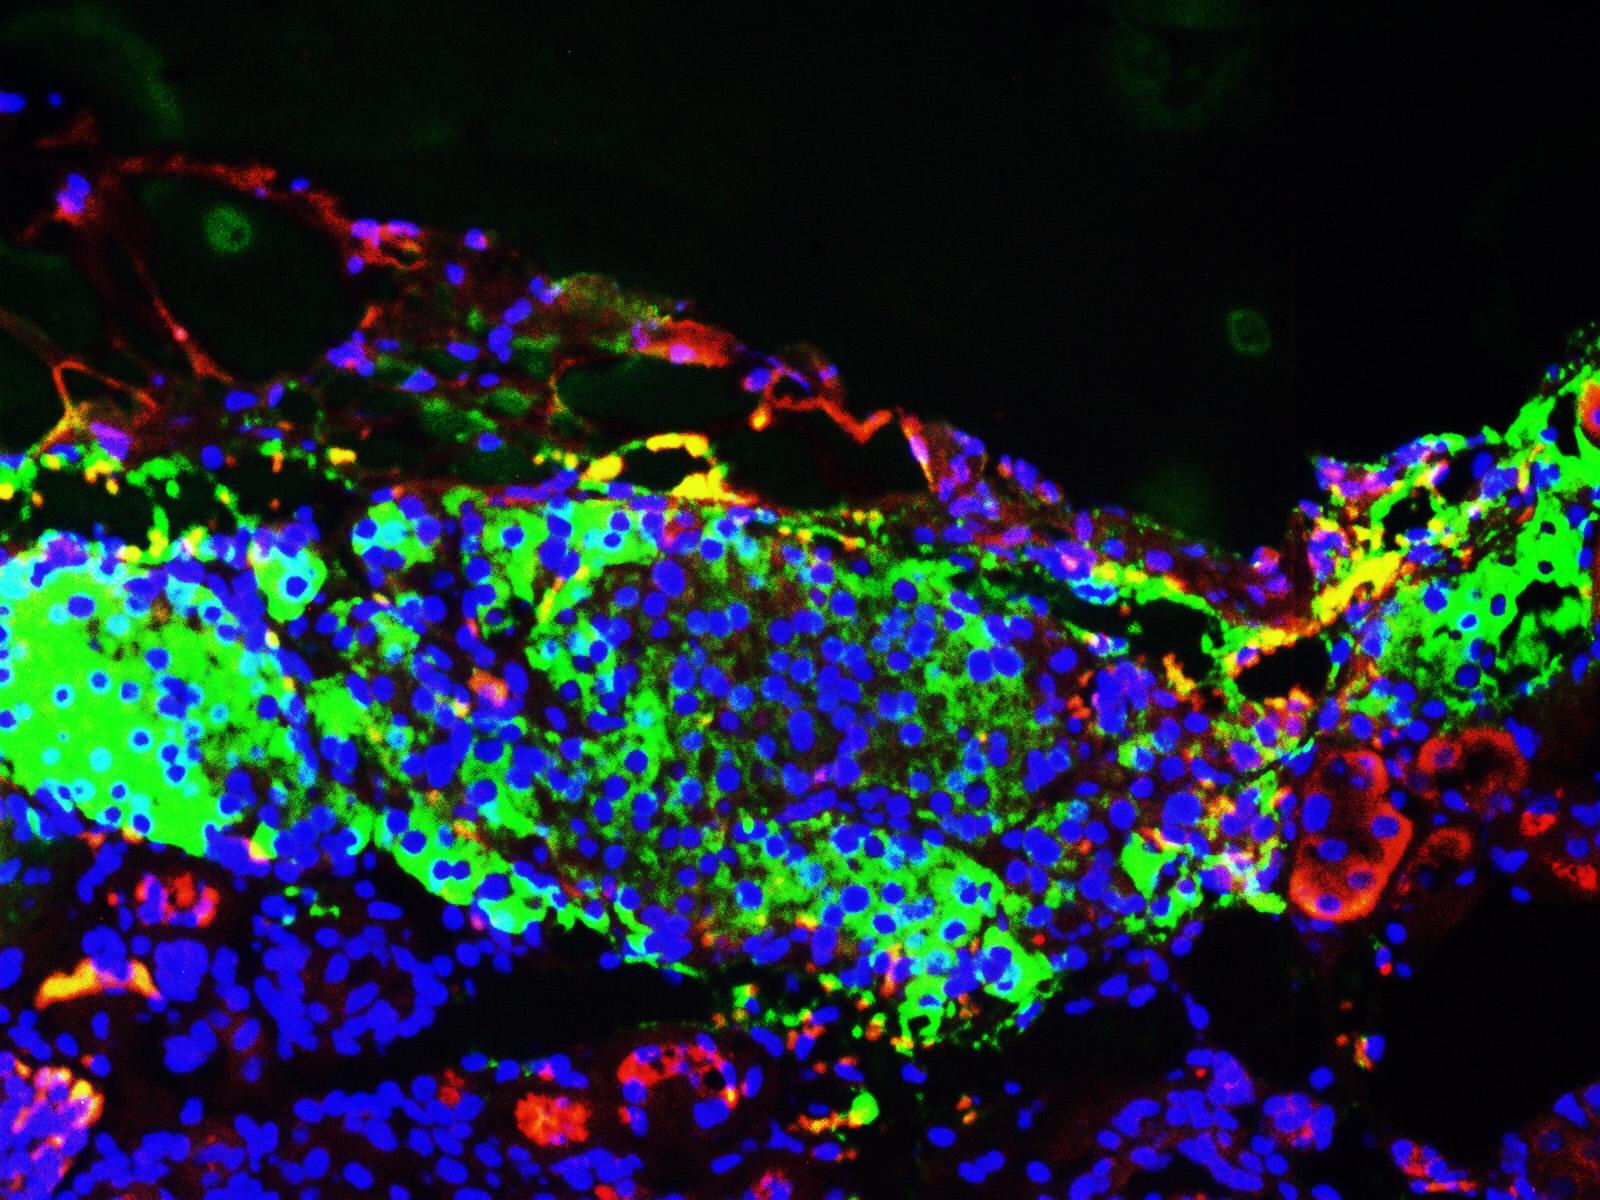 ibeta-in-Kidney-Ins-Green-Gcg-Red-Nucleus-Blue-x20.jpg